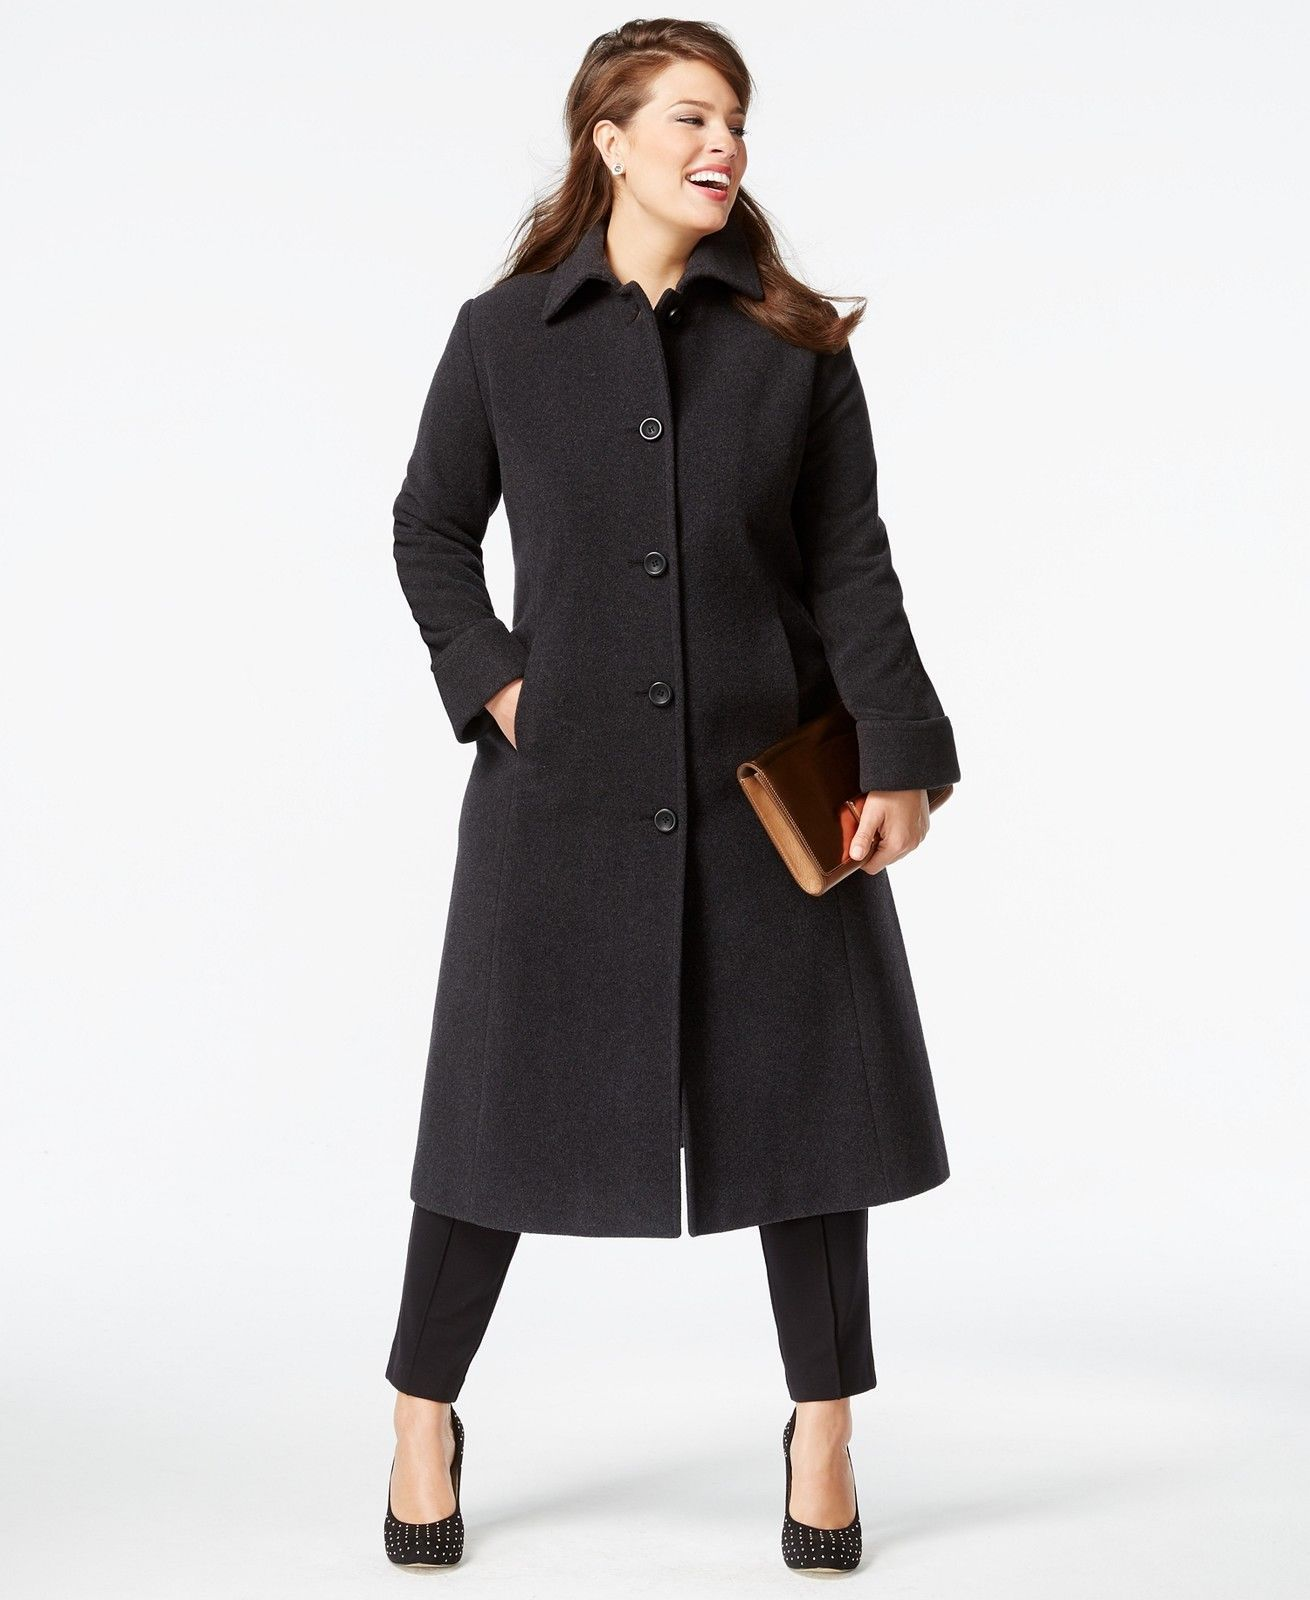 7707be02b18 Jones New York Plus Size Wool Maxi Women s Coat Charcoal 22W NWT MSRP  460